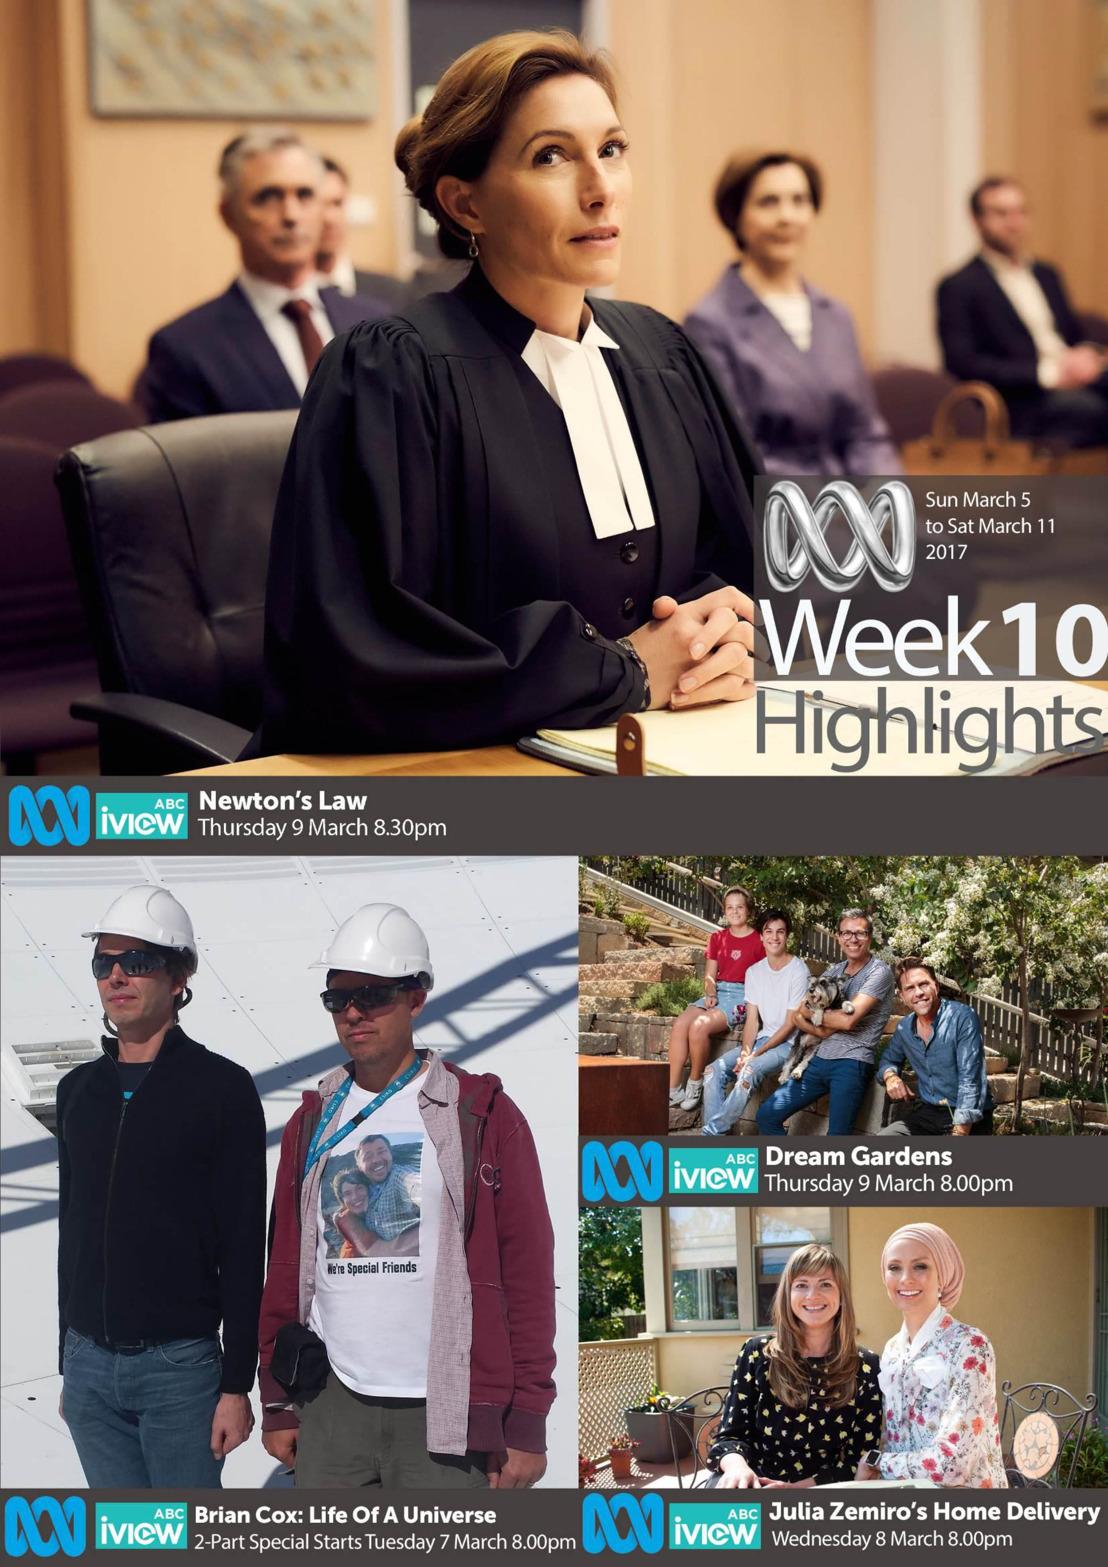 ABC Program Highlights - Week 10